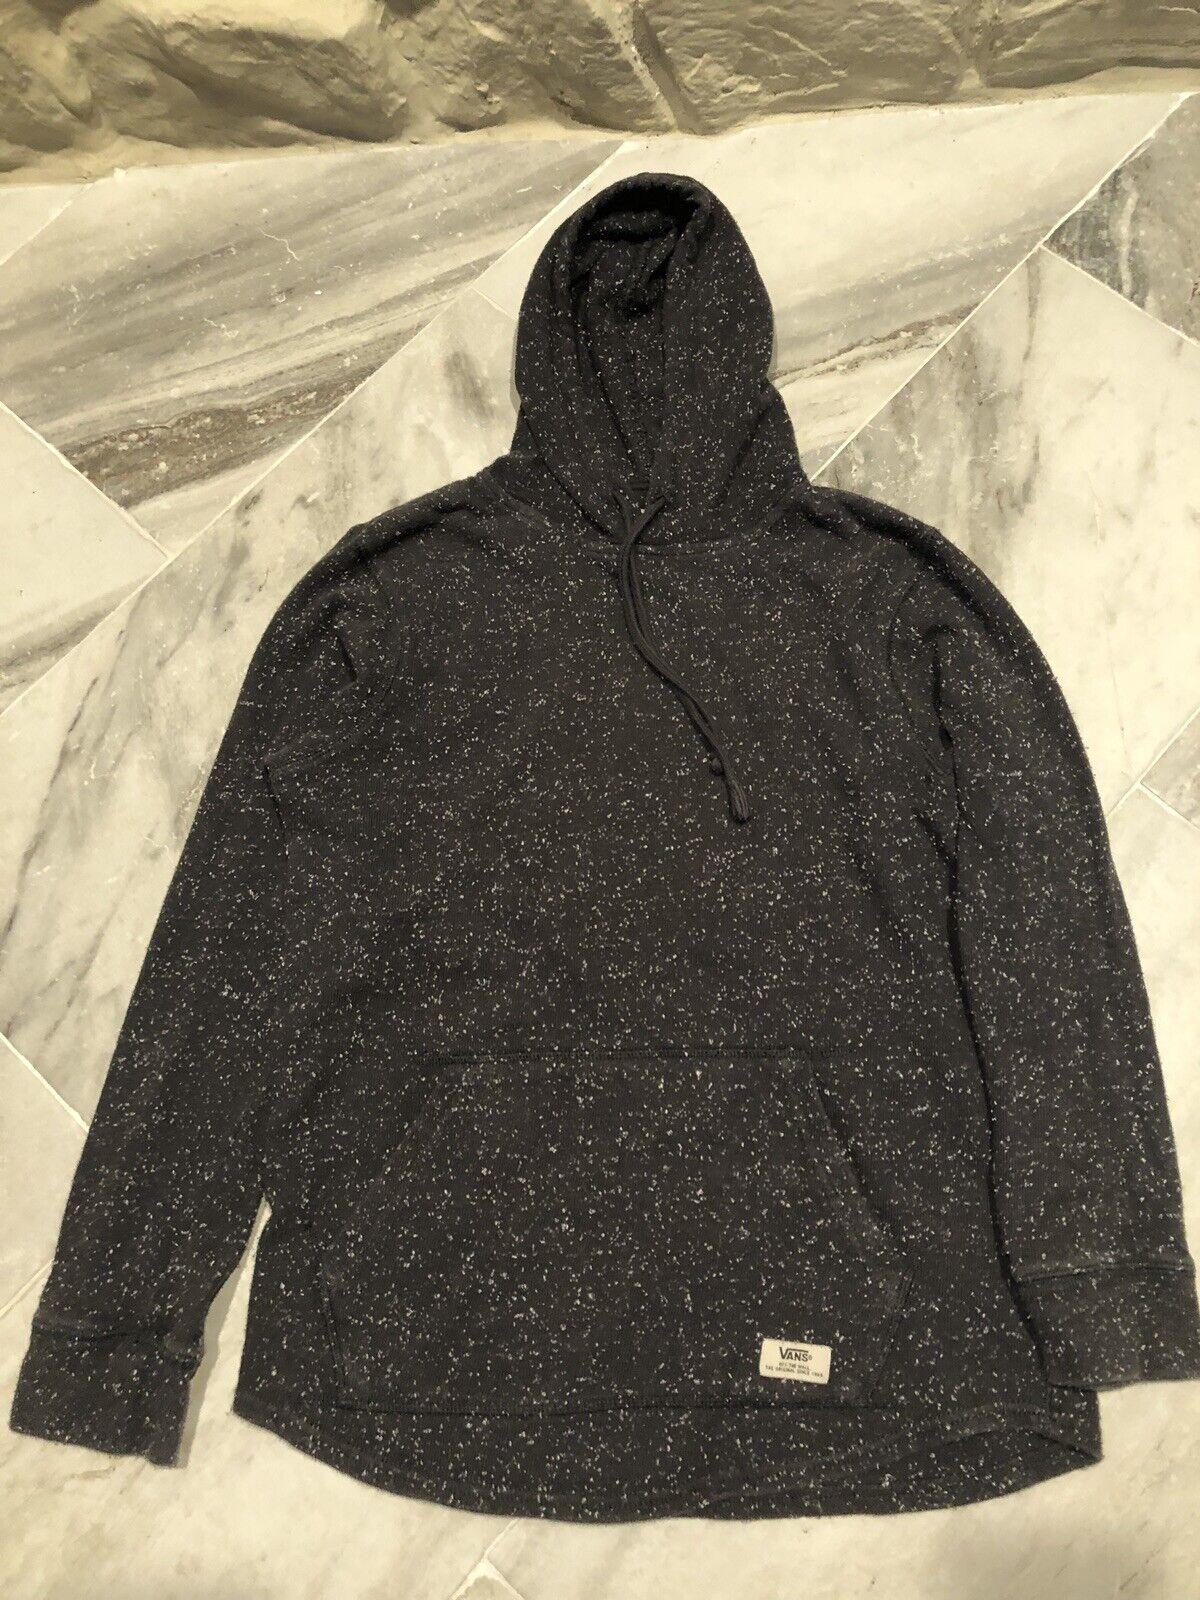 Vans Gray Hoodie Sweatshirt/Hooded Sweater Unisex Size Small Speckled Print